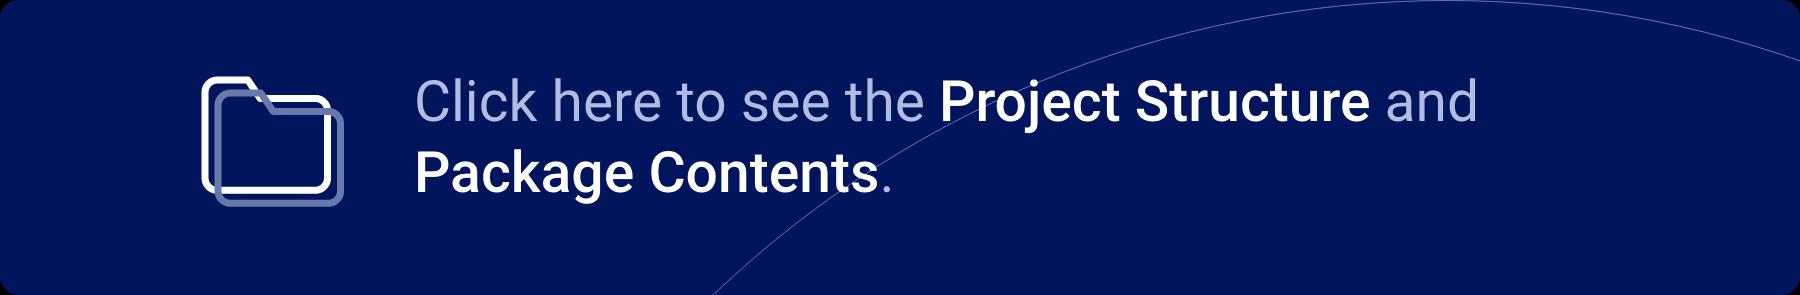 Project%20Structure - Midone - Laravel 8 Admin Dashboard Template + HTML Version + XD Design File